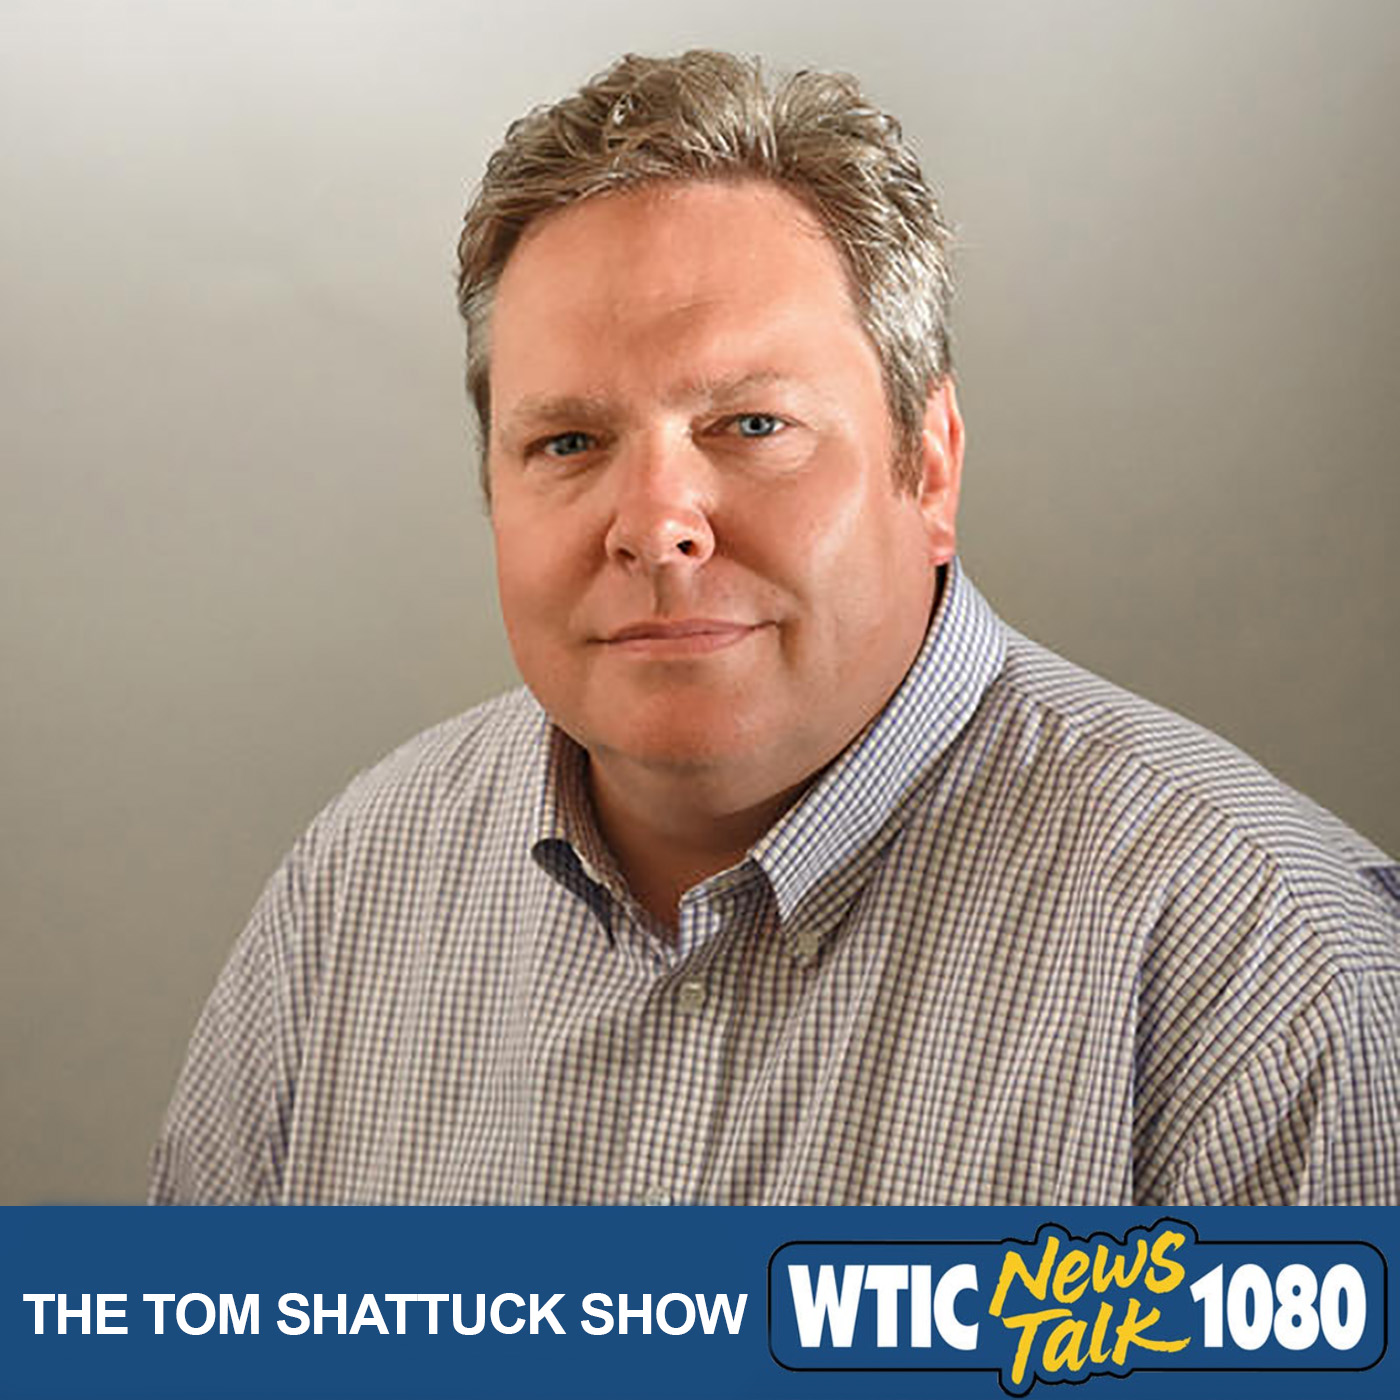 The Tom Shattuck Show